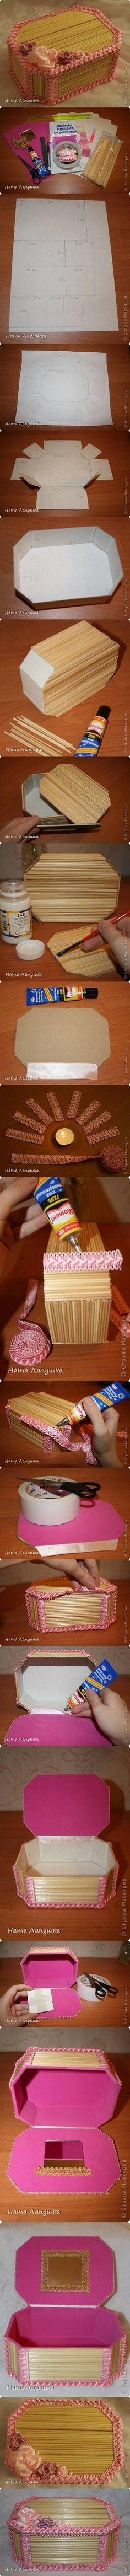 DIY Pink Mood Jewelry Box